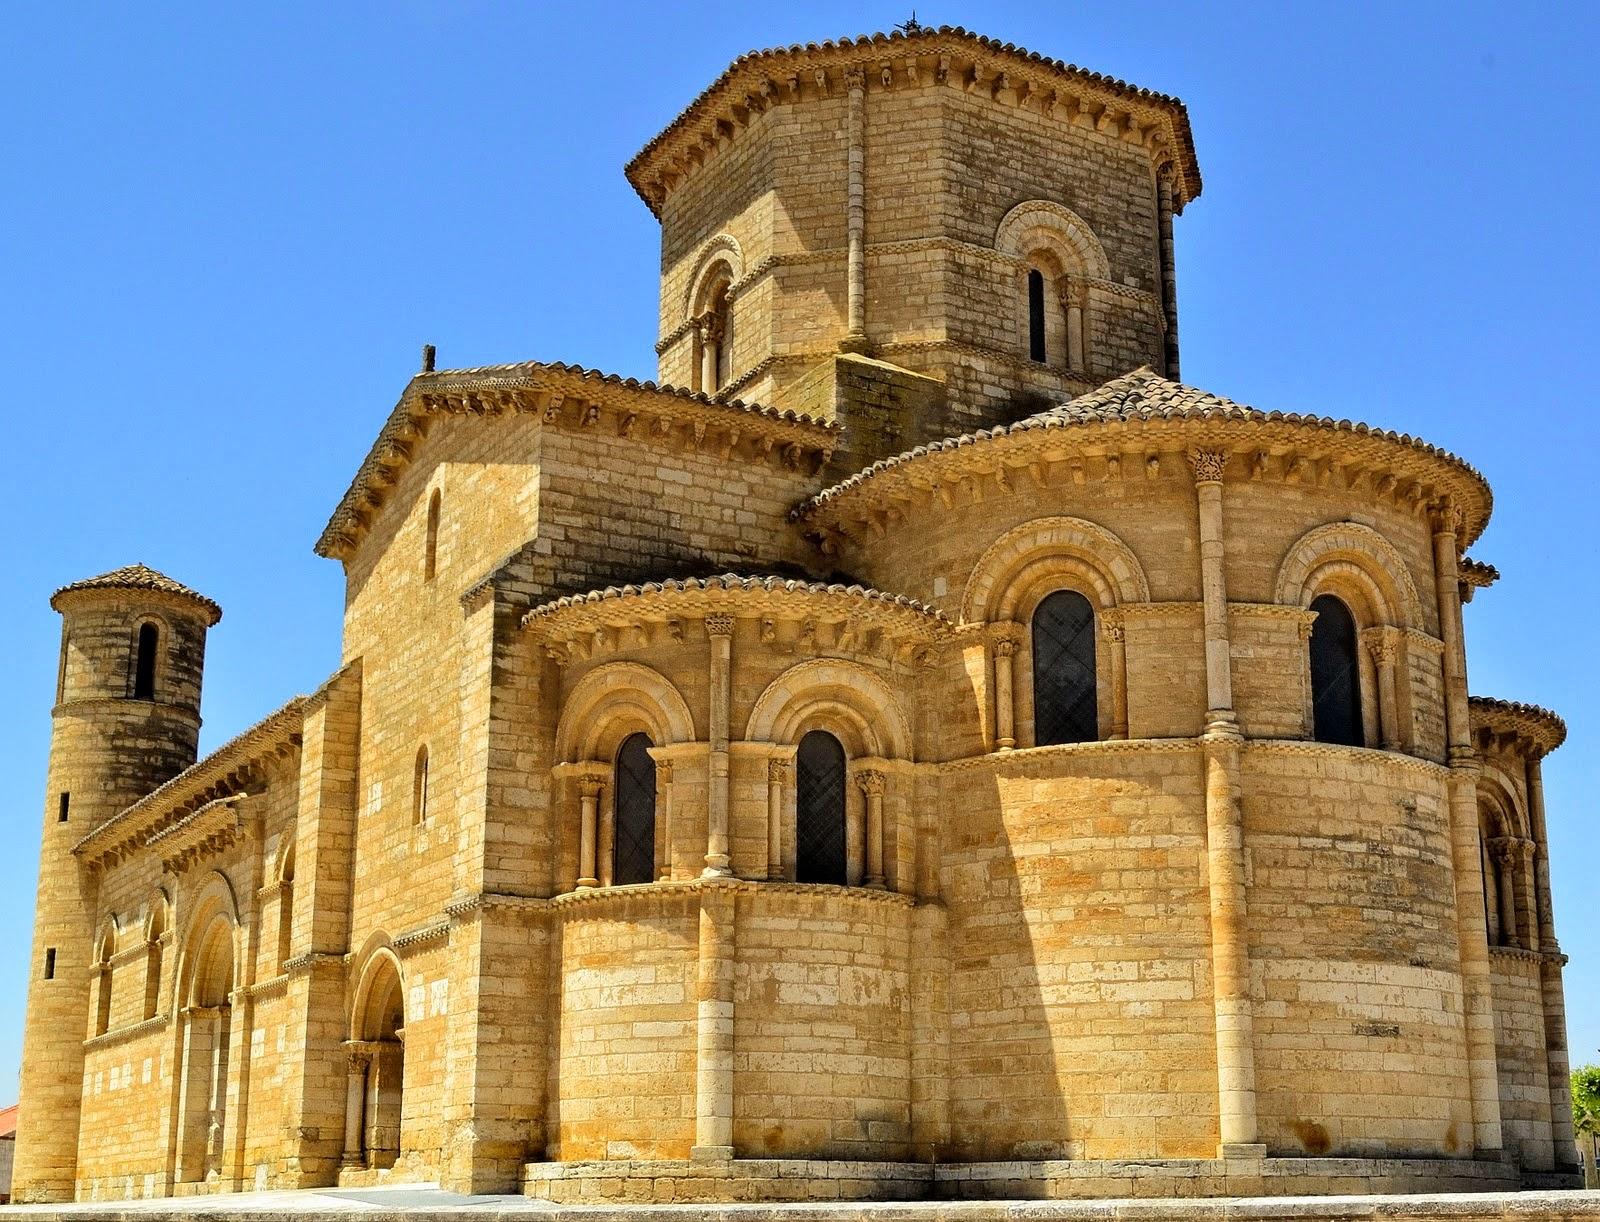 Historia de la arquitectrura ii rom nico Arte arquitectura y diseno definicion